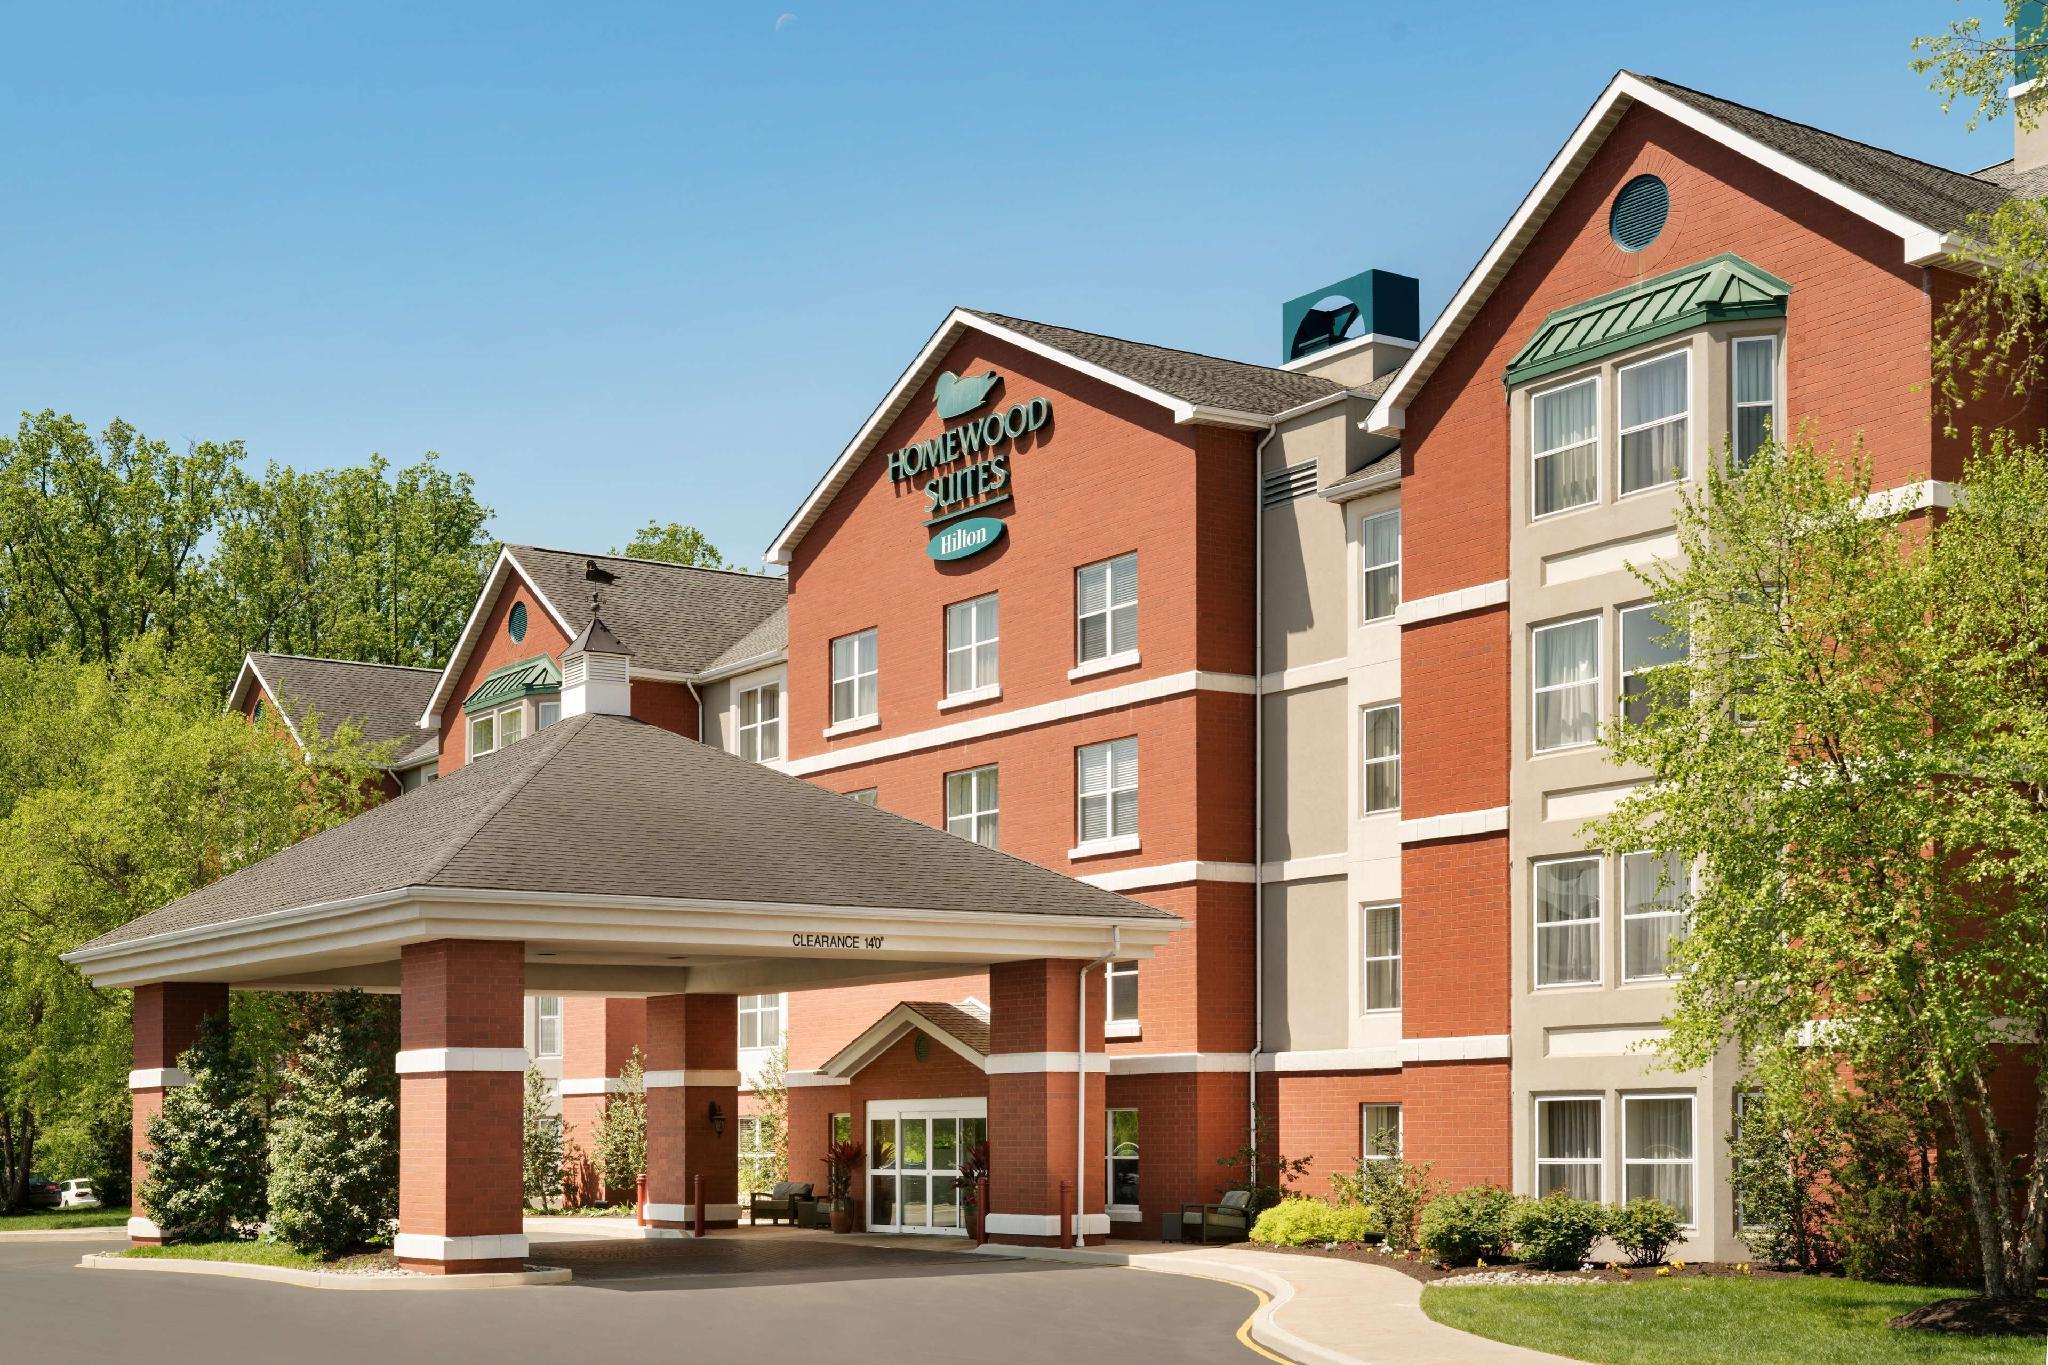 Homewood Suites By Hilton Wilmington Brandywine Valley